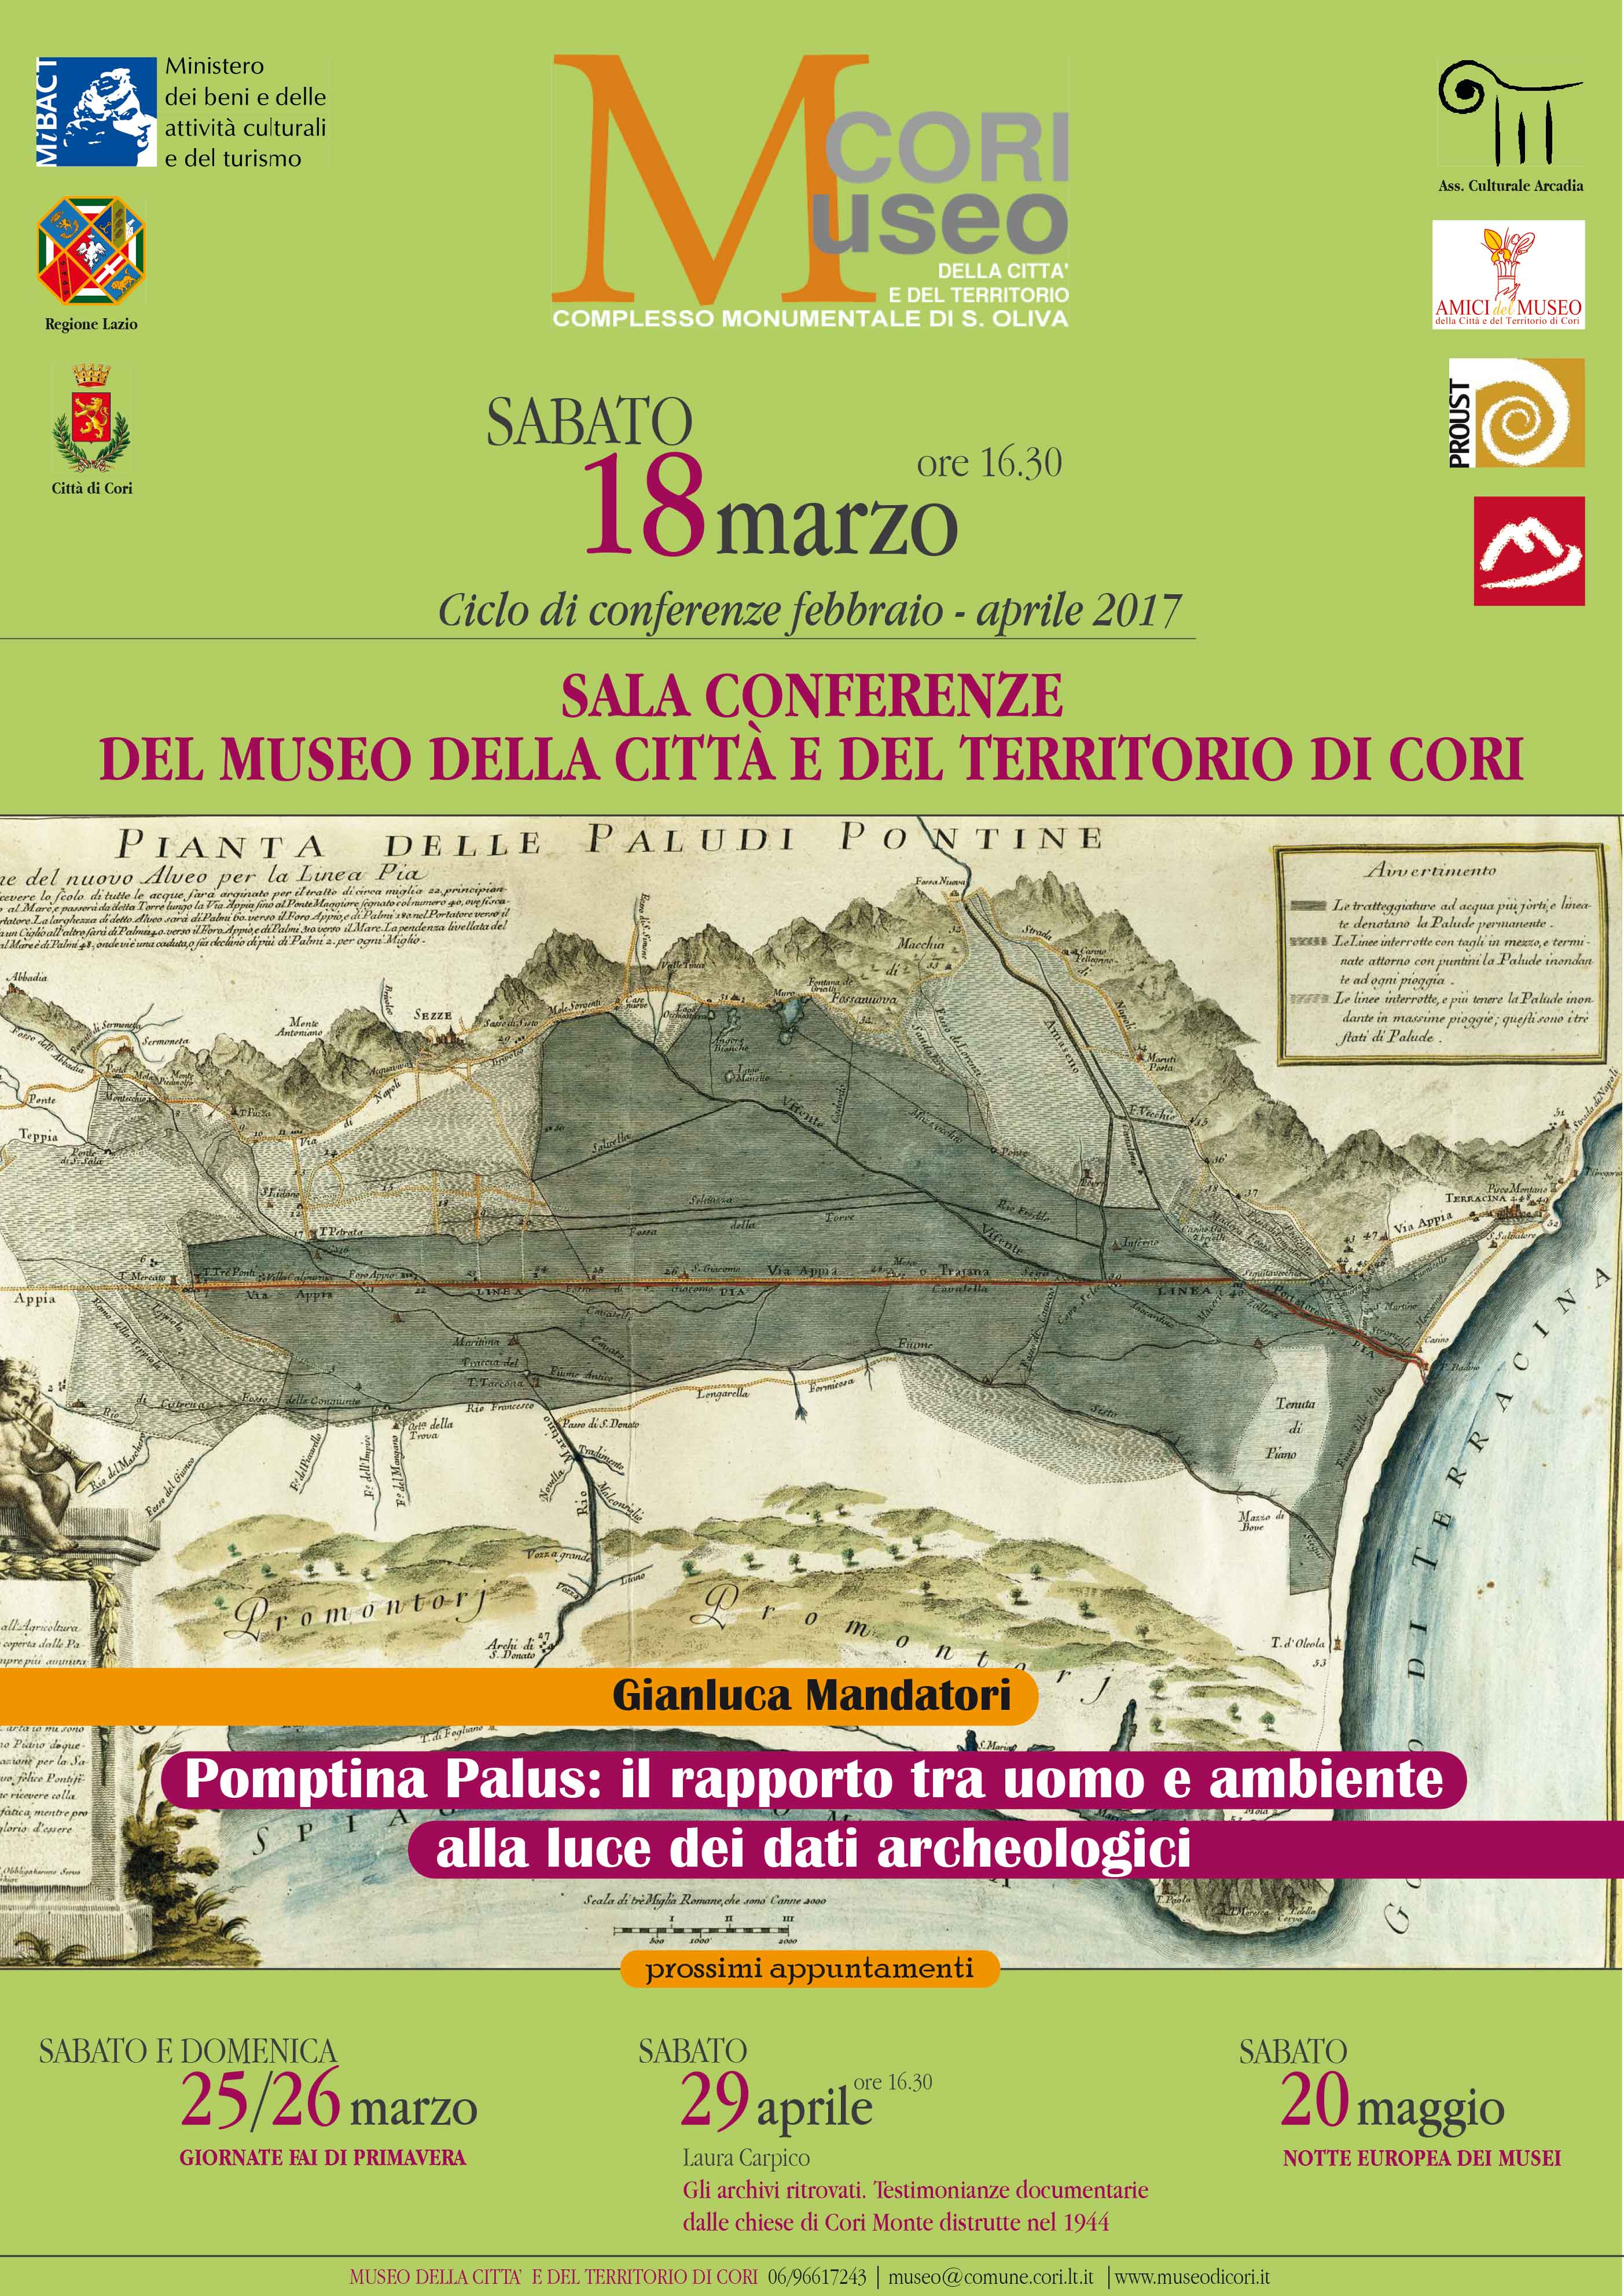 Conferenza Paludi Pontine Museo di Cori